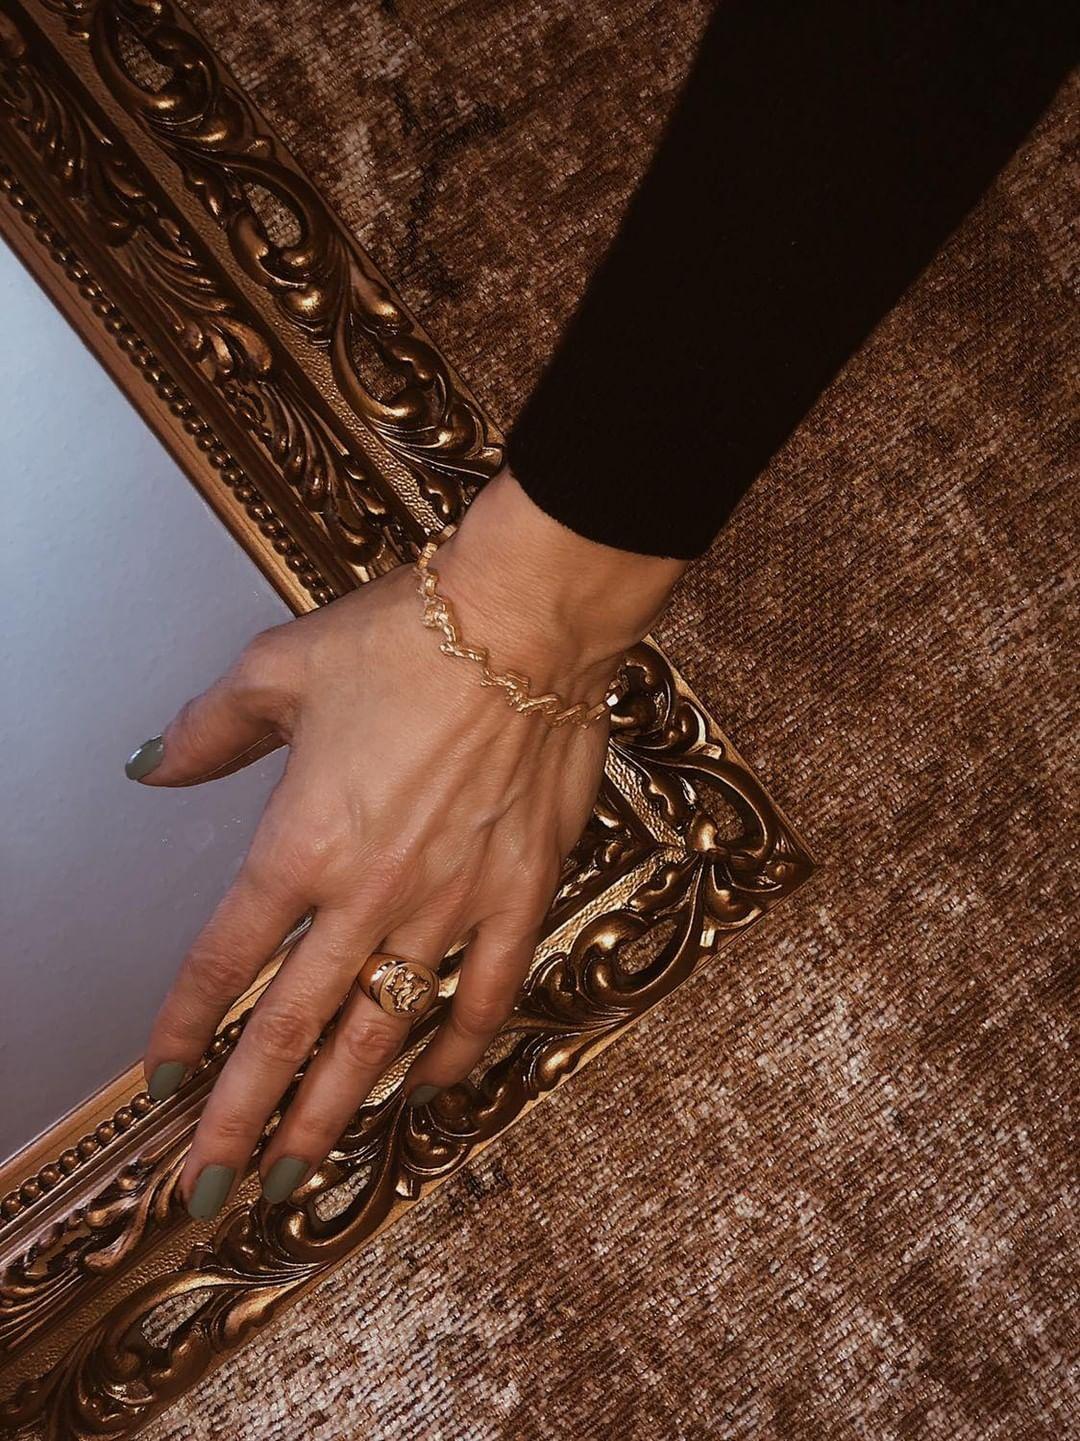 @venswife - Wearing Diploria Petite Bracelet and Diploria Unisex Signet Ring.